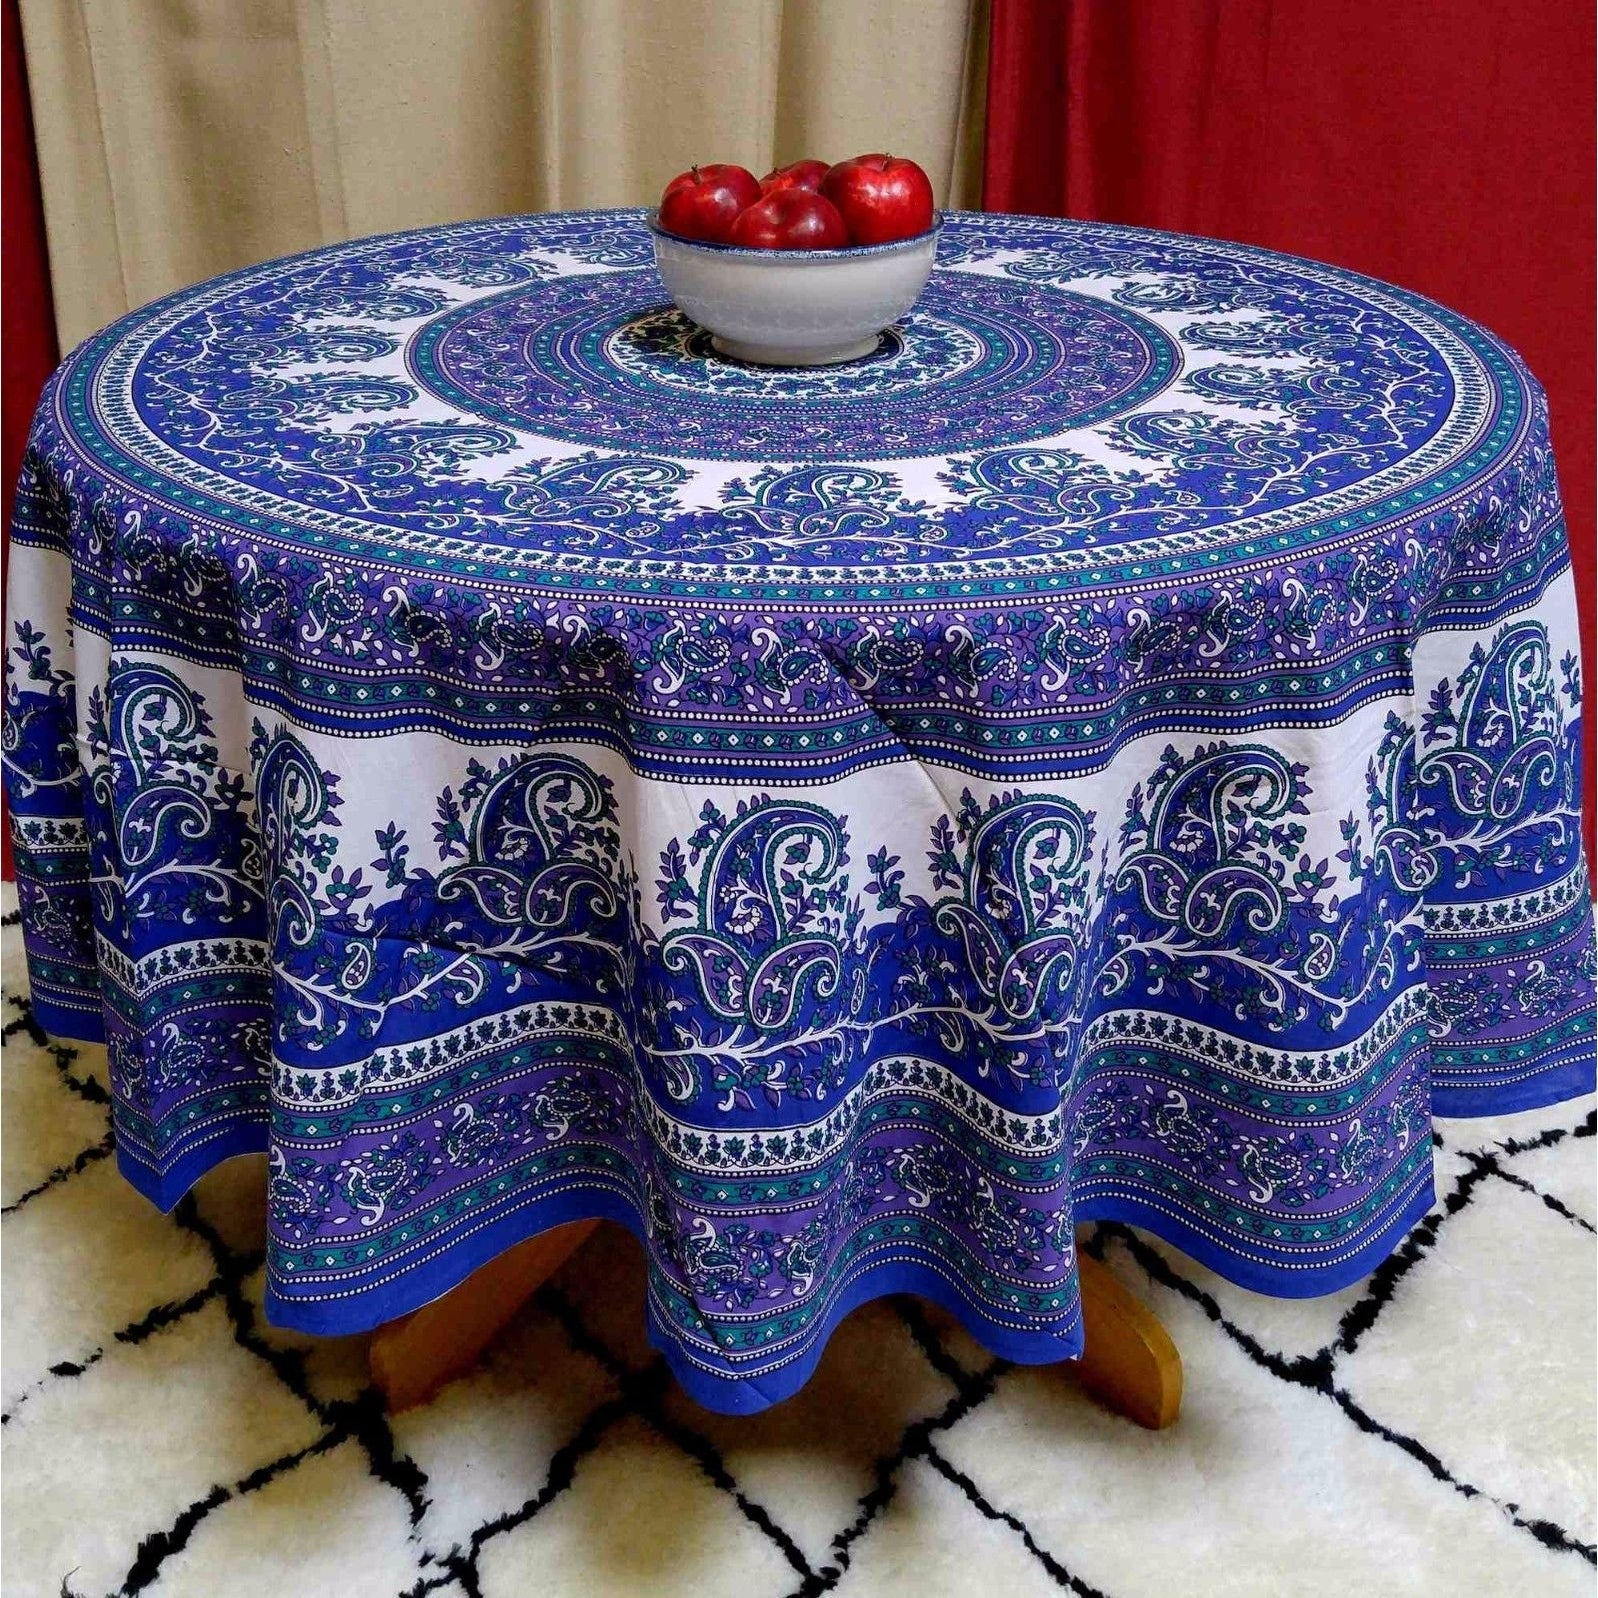 Cotton Mandala Paisley Floral Tablecloth Round Blue Purple - 72 Inches - Thumbnail 0